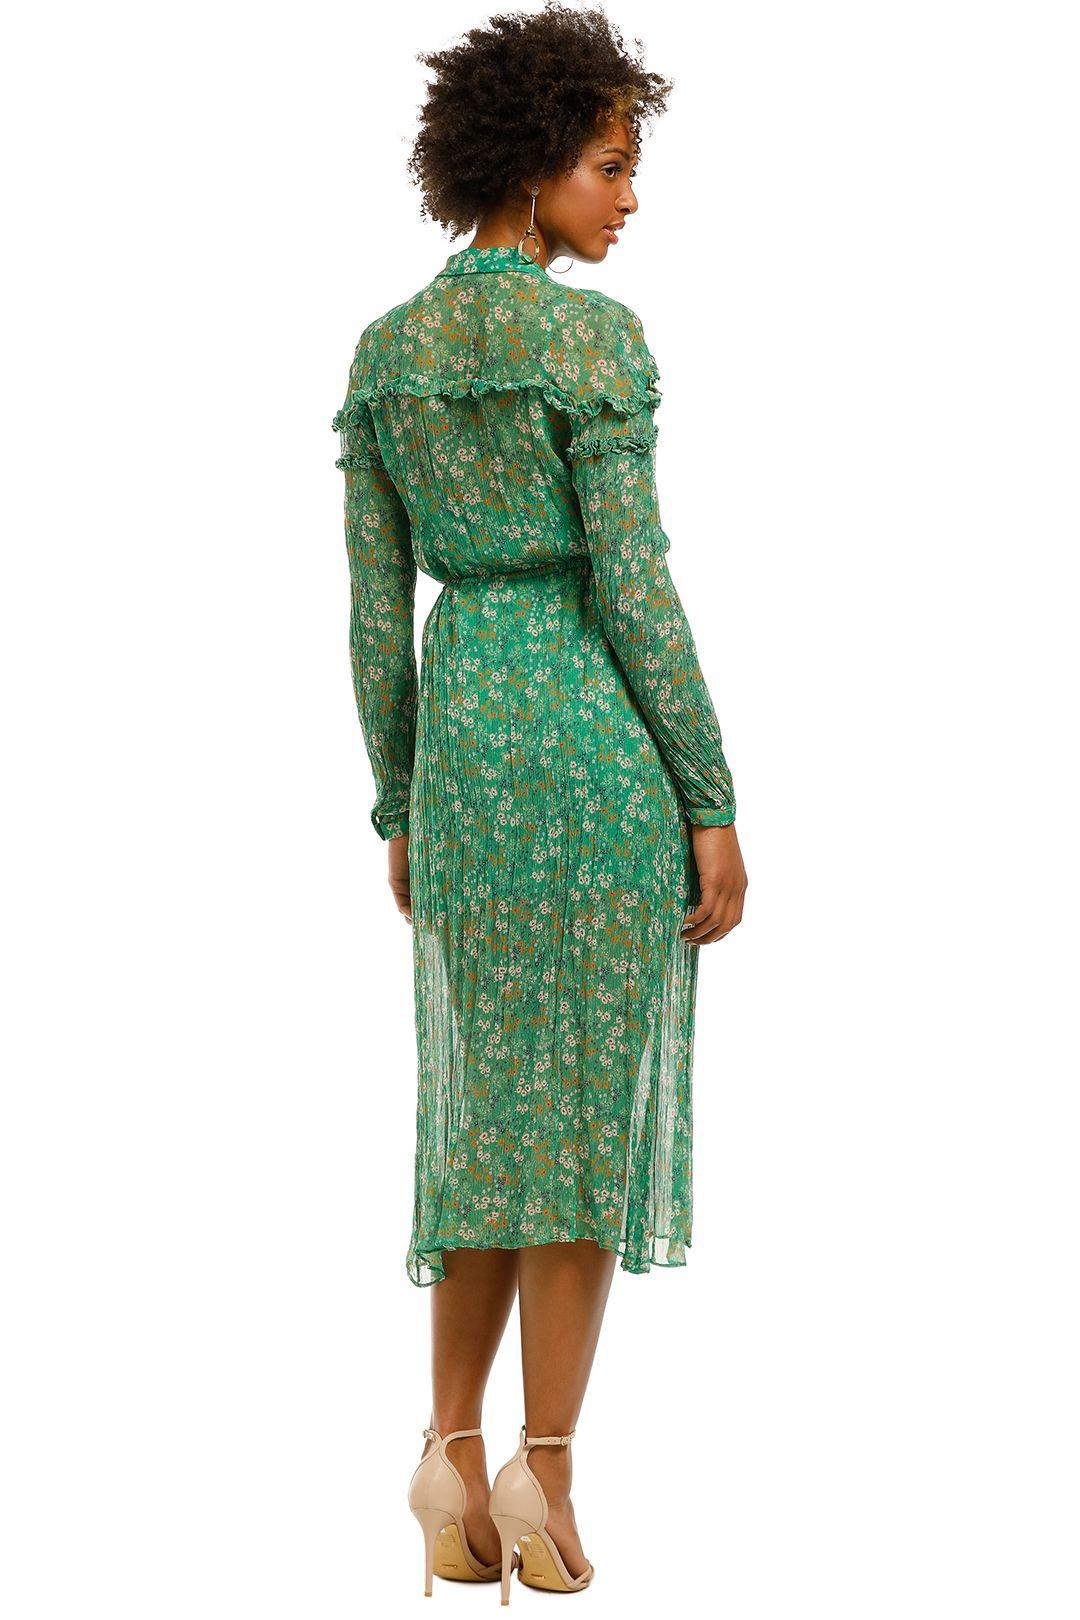 Stevie-May-Jade Valentine-LS-Maxi-Dress-Moss-Floral-Back